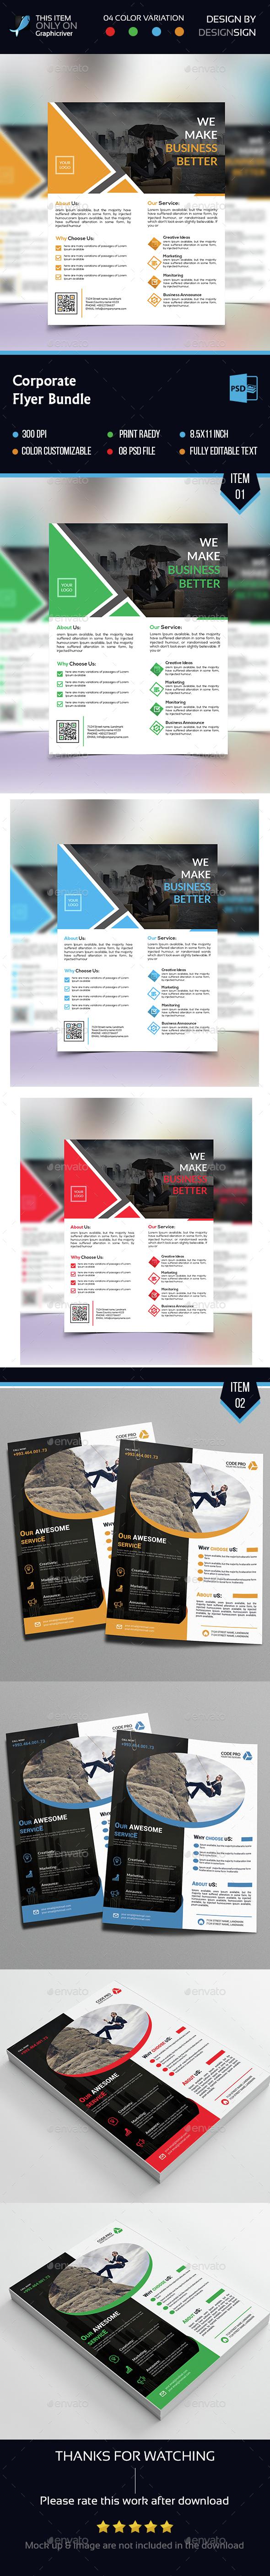 Creative Business flyer Bundle - Flyers Print Templates